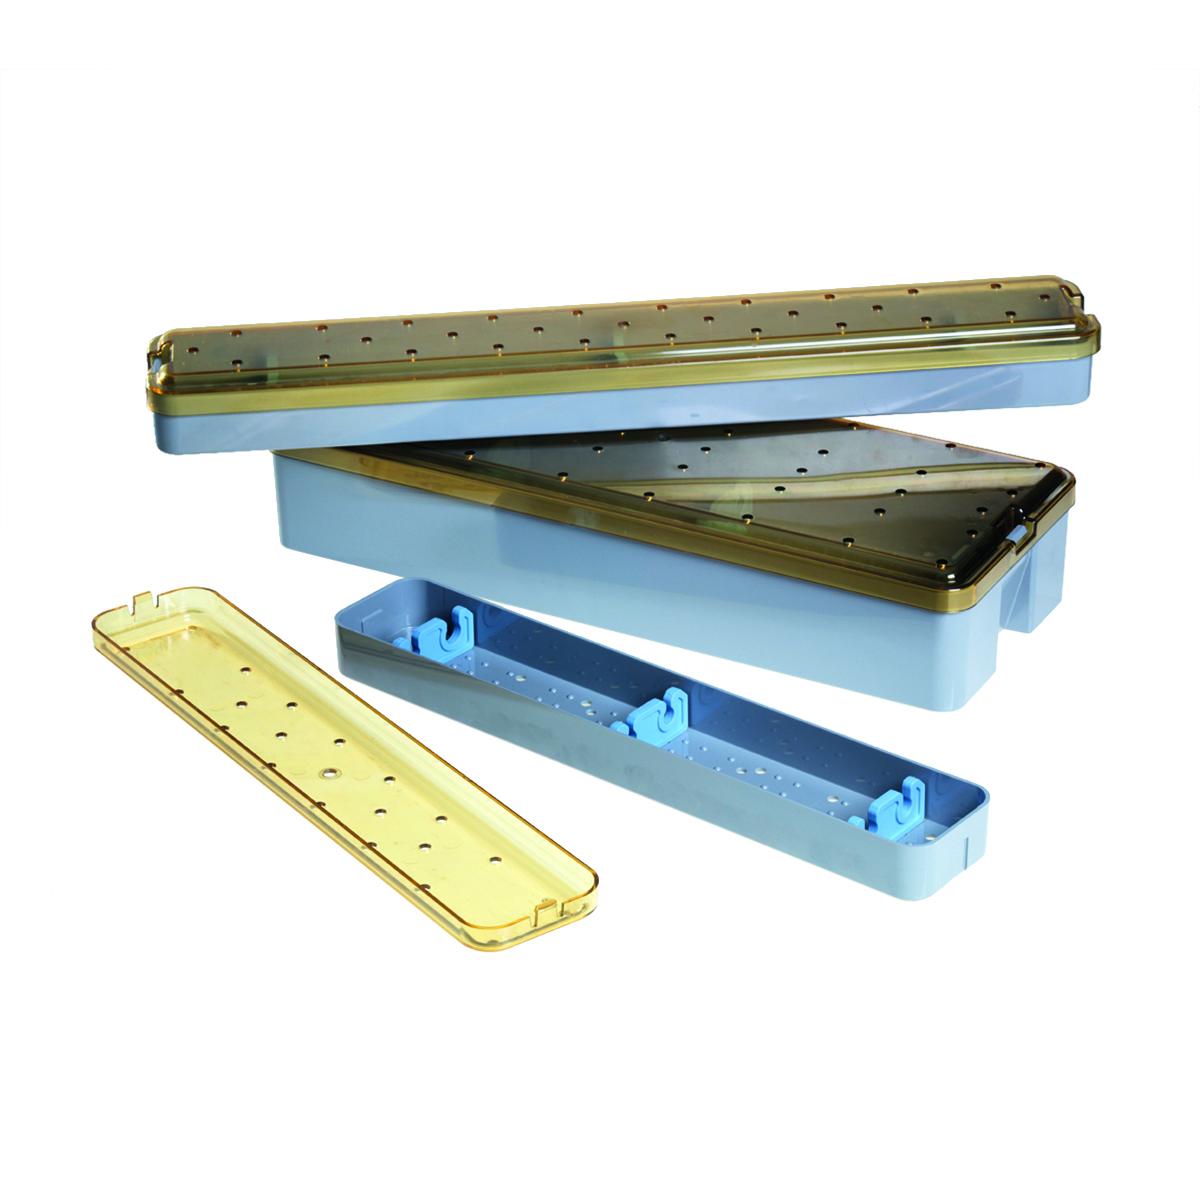 Plastic Scope Tray Image